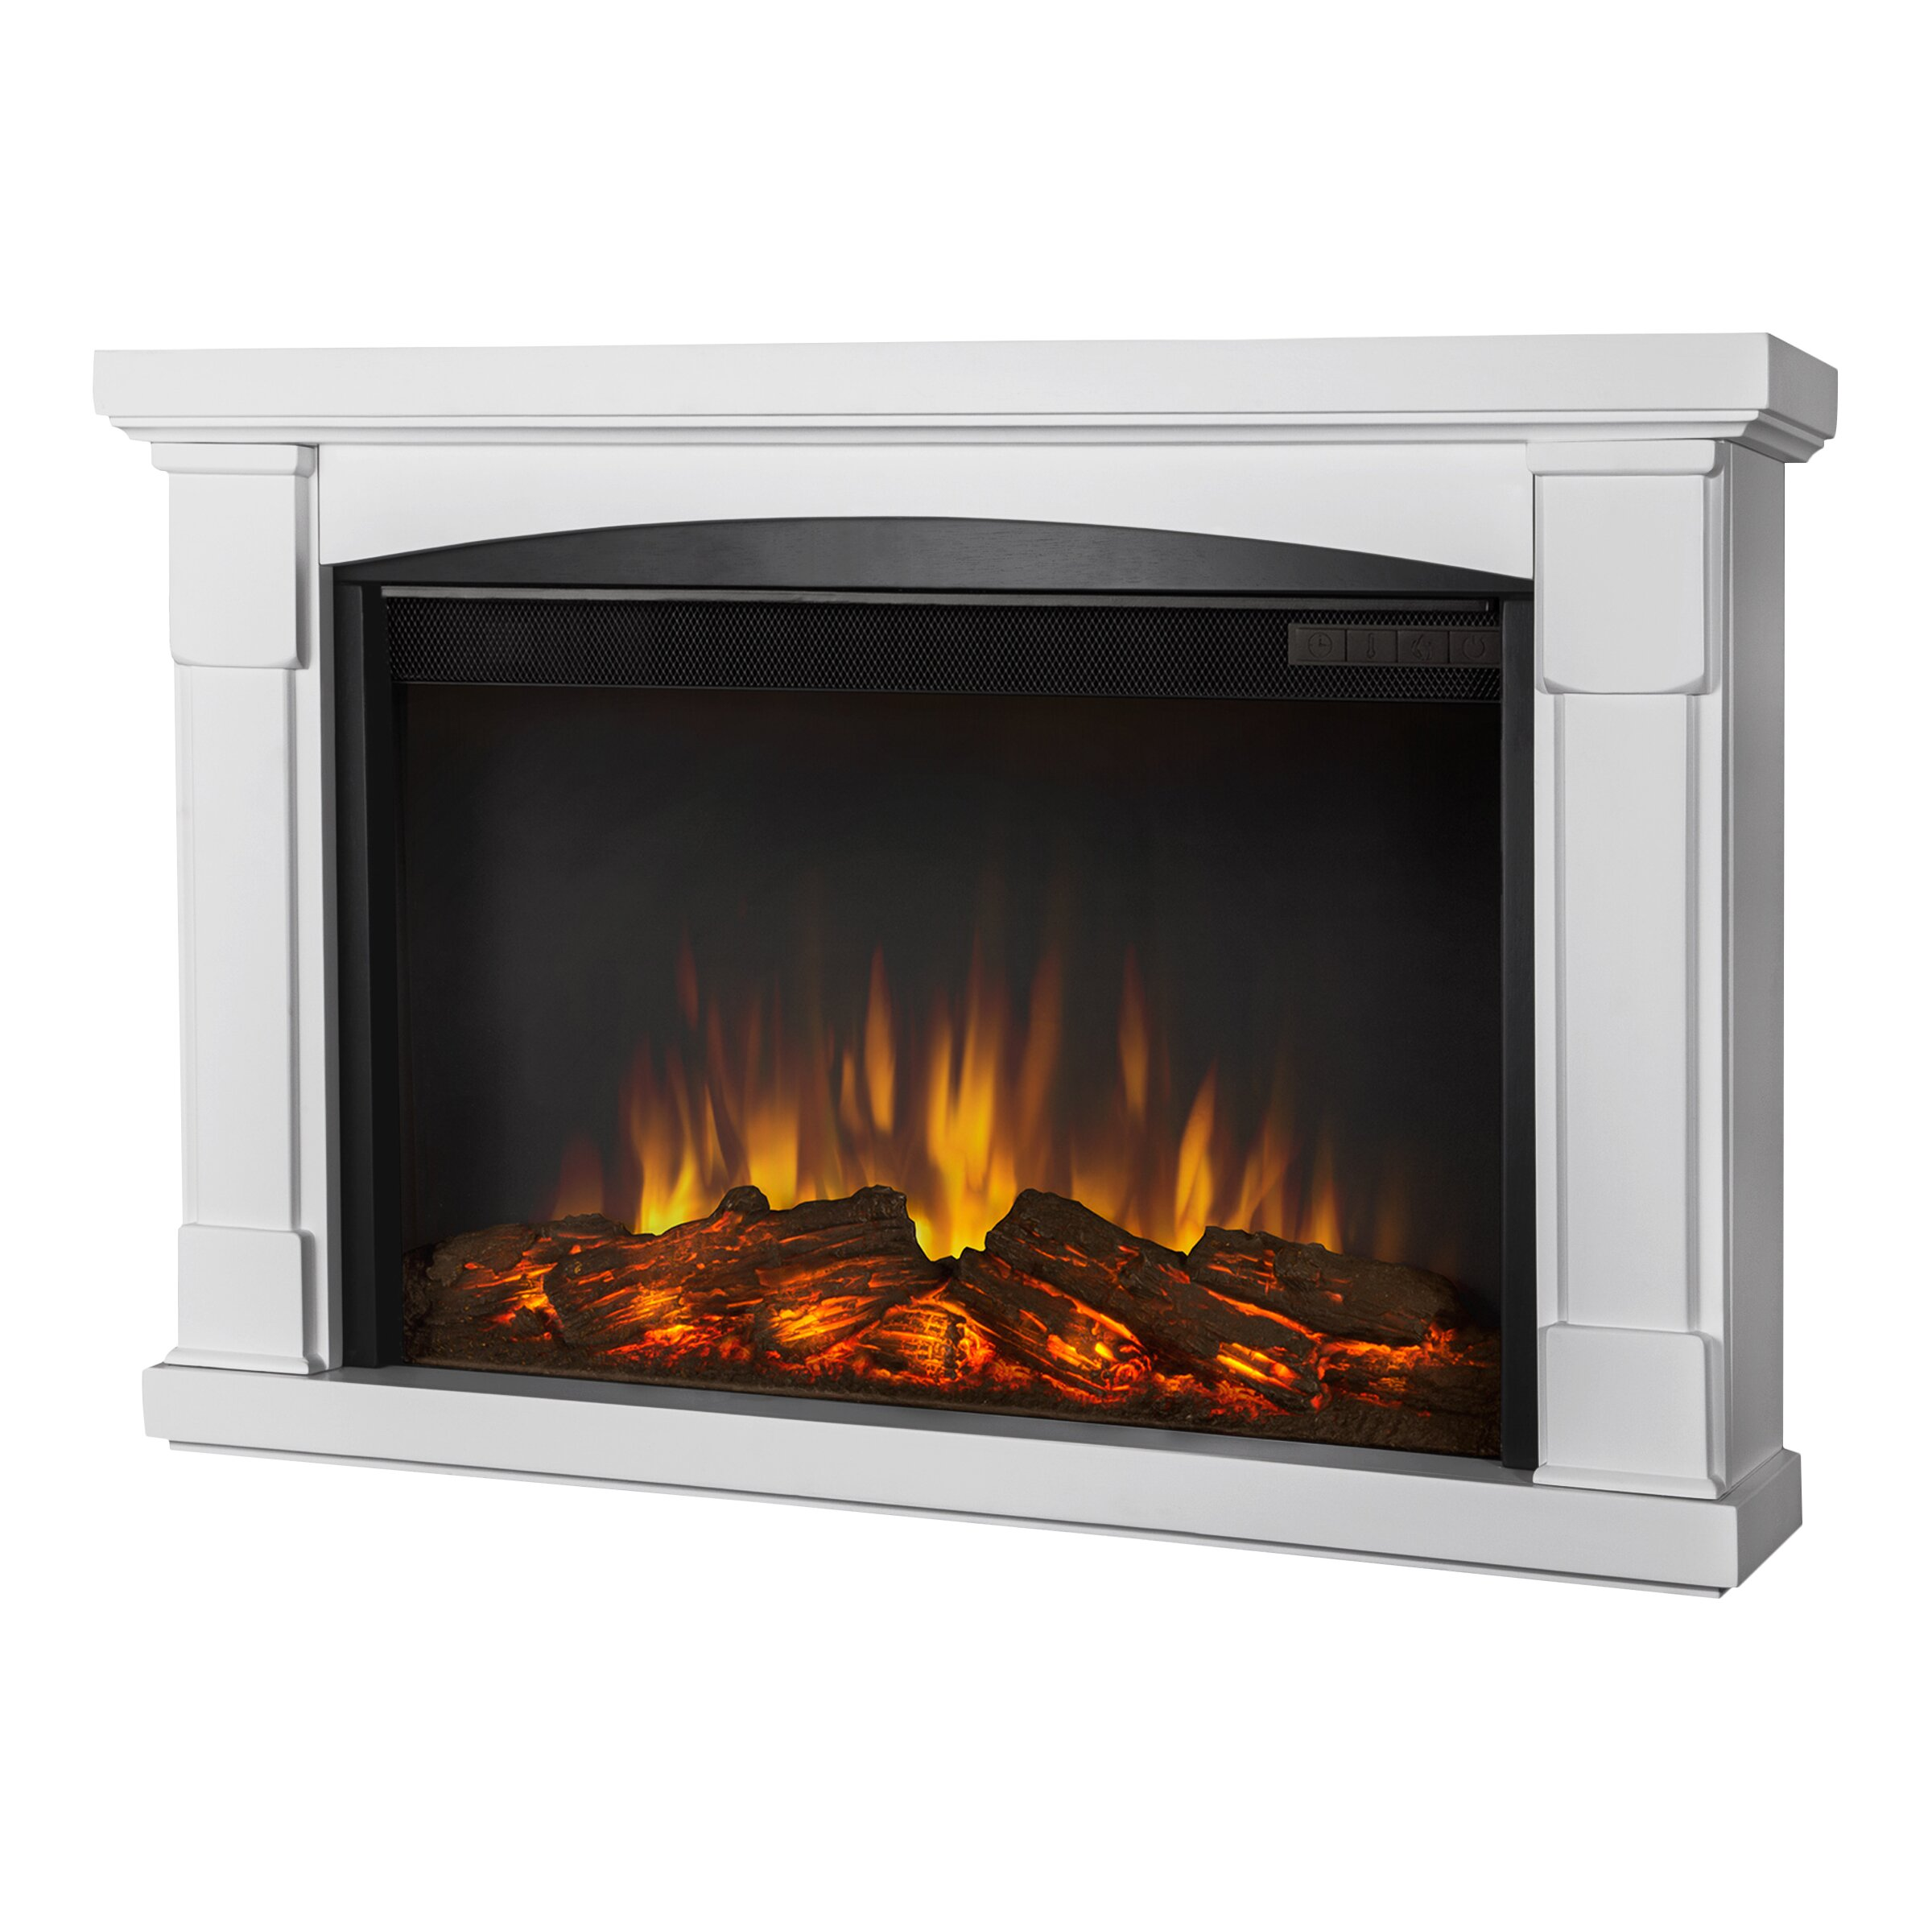 slim brighton wall mounted electric fireplace wayfair